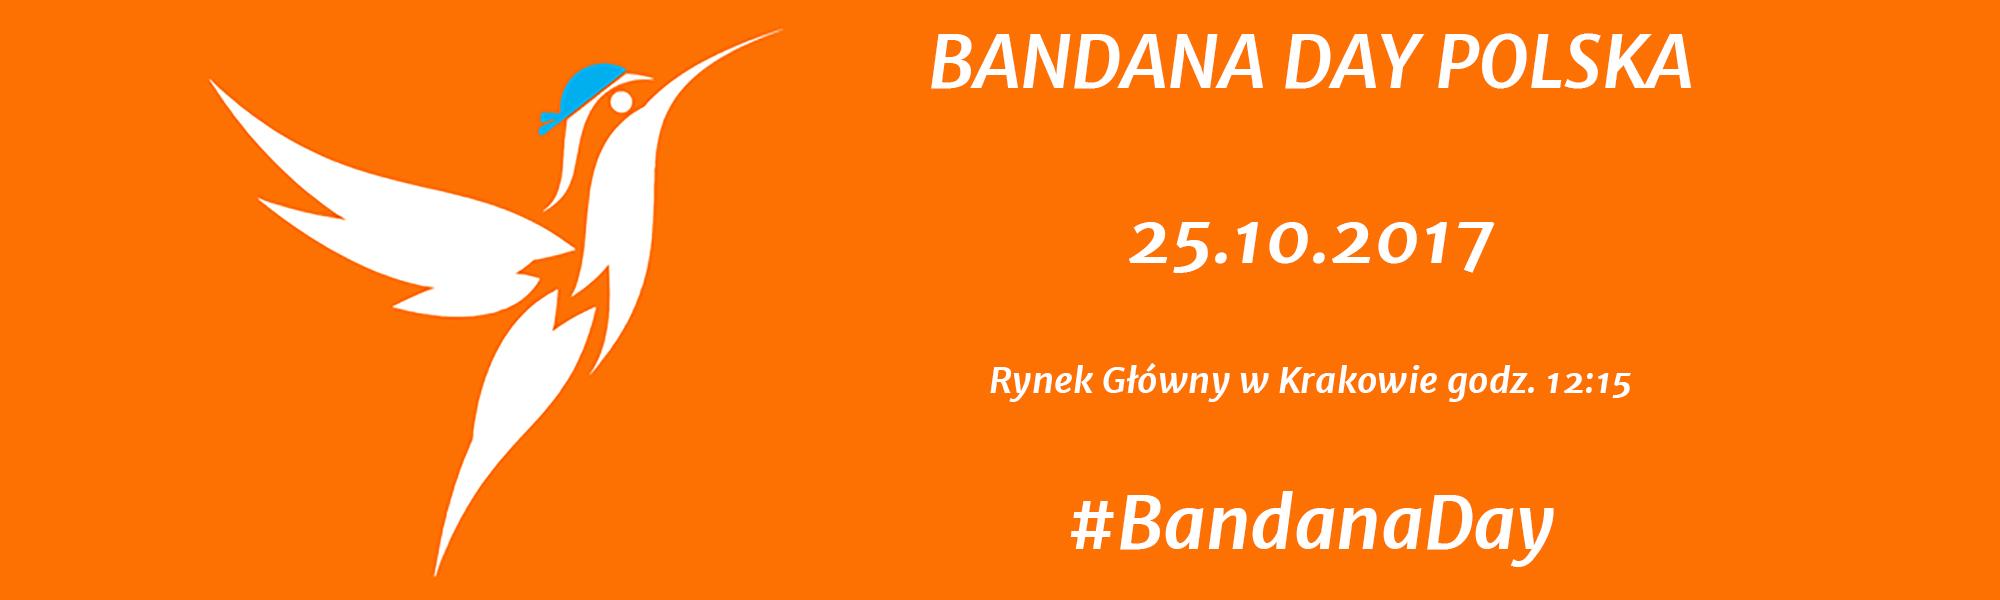 Bandana Day 2017